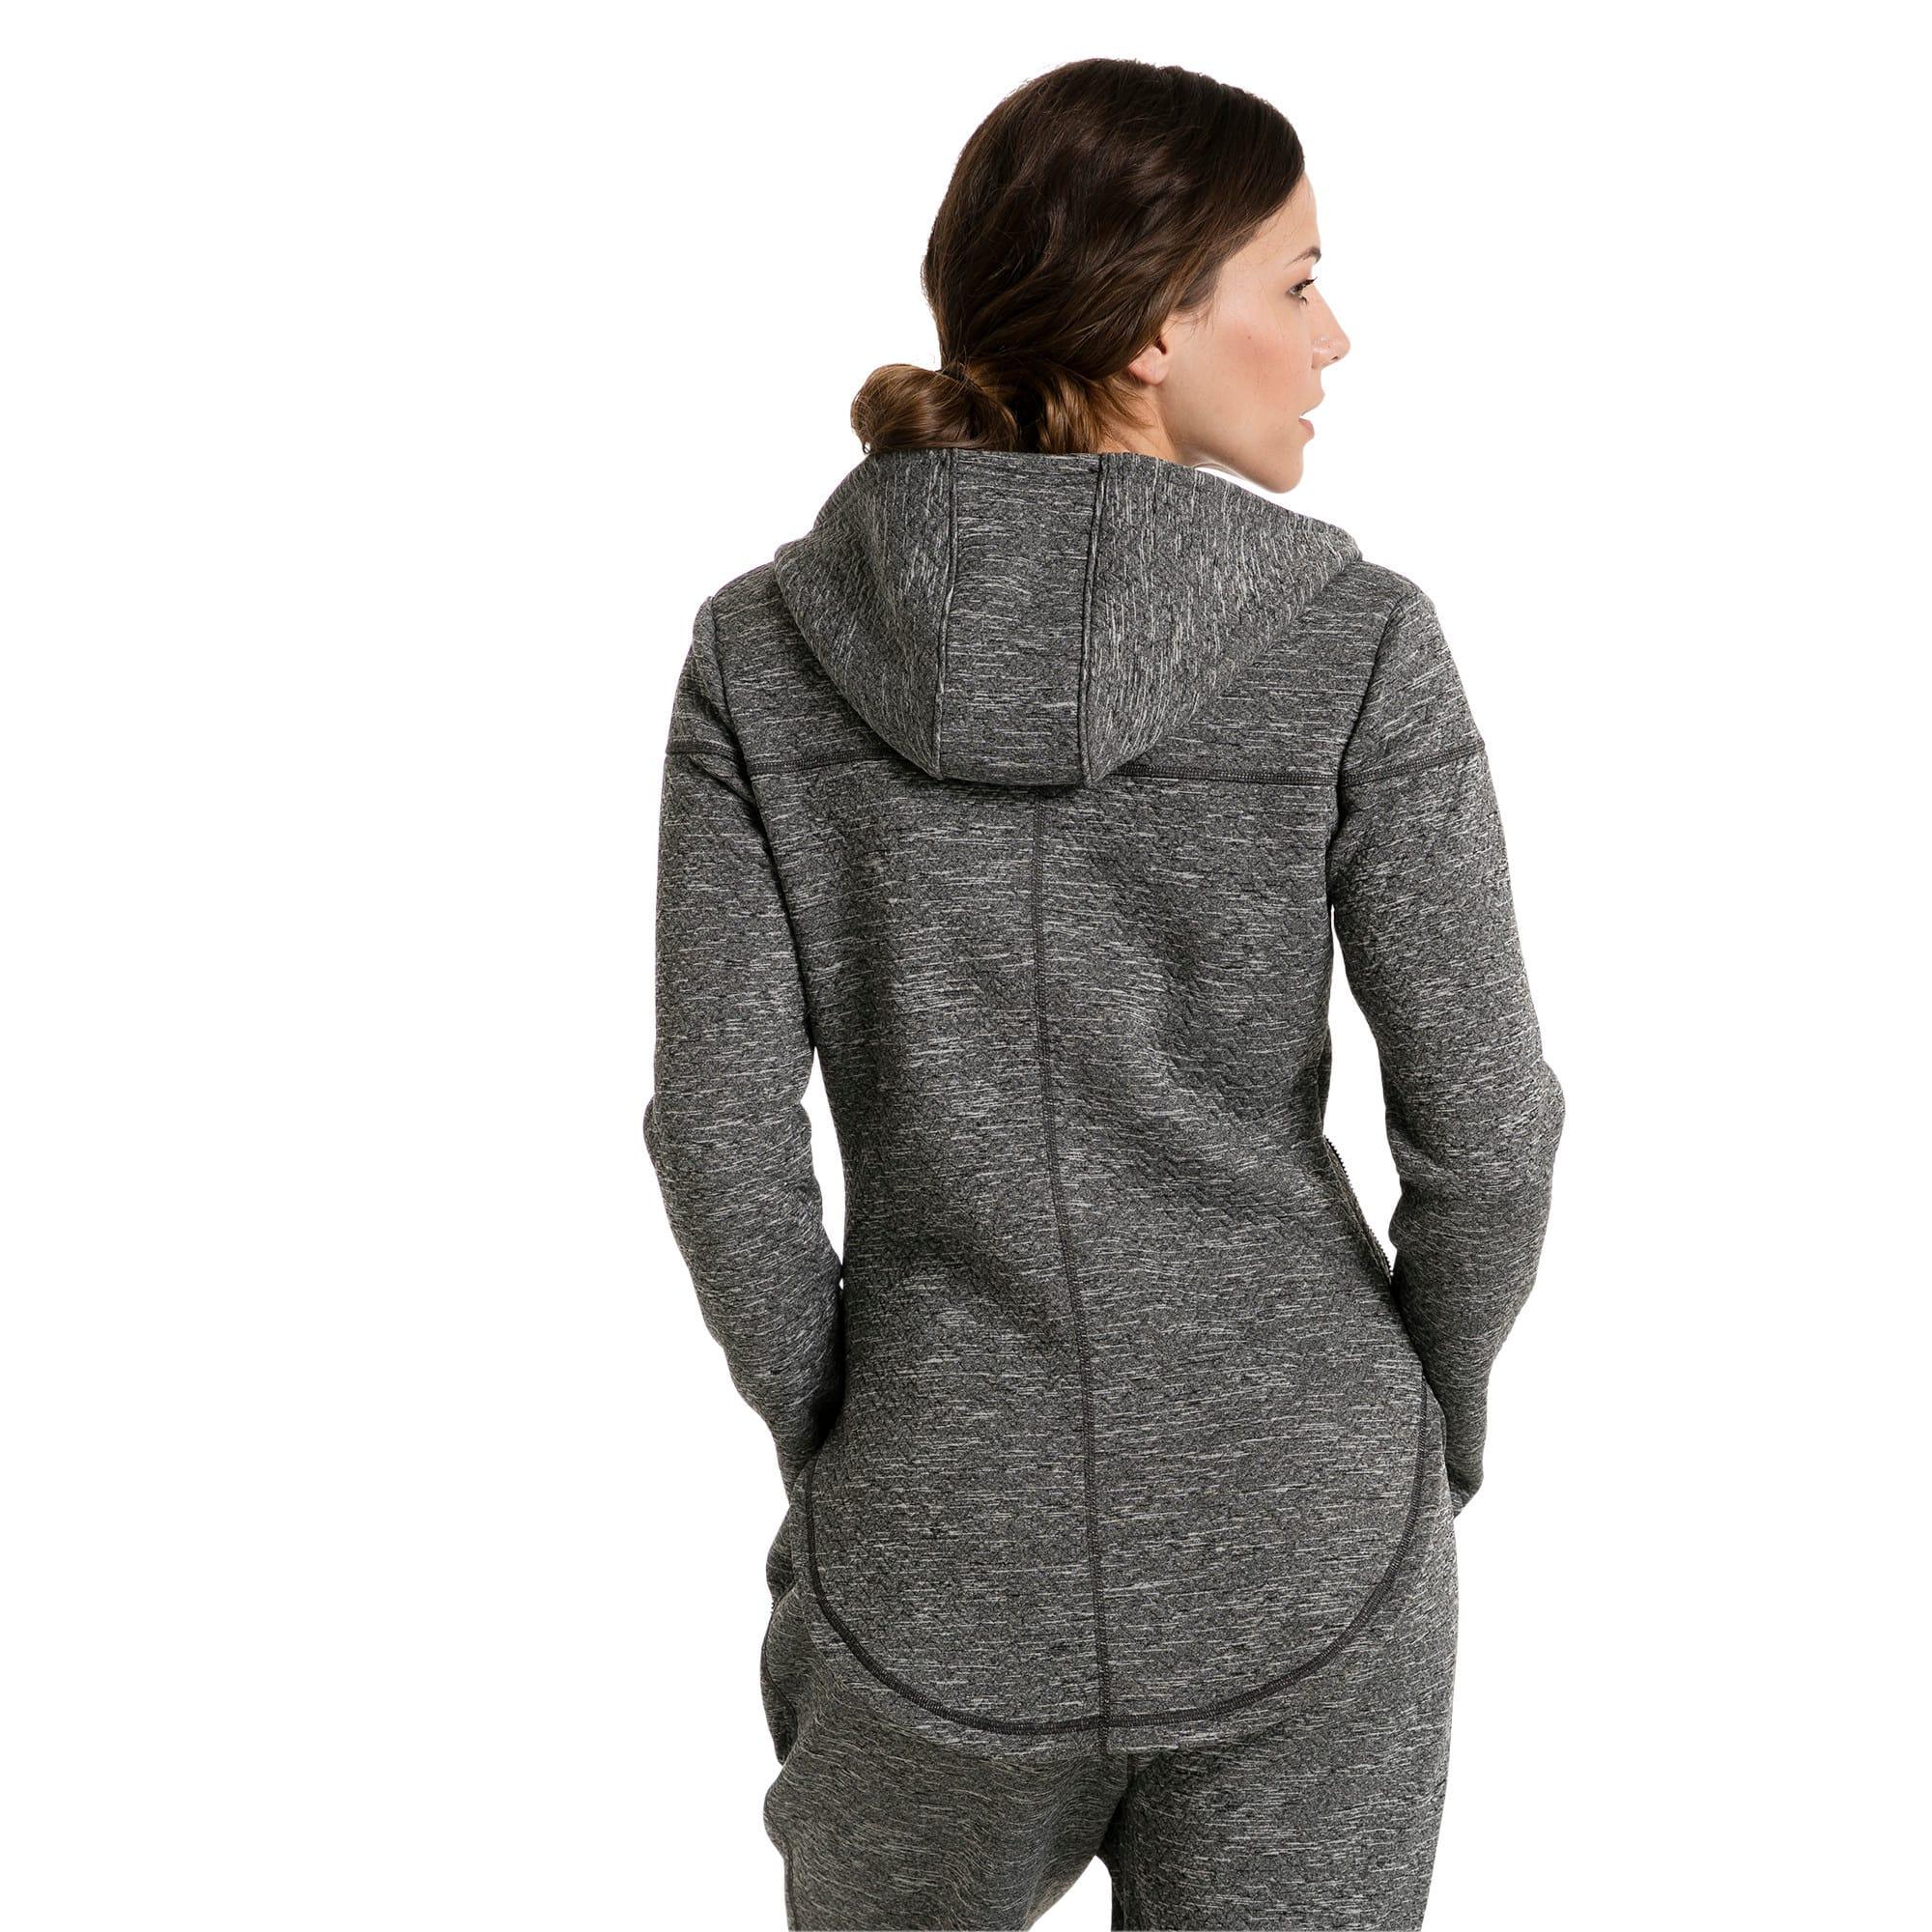 Thumbnail 2 of Active Training Women's Nocturnal Winterized Jacket, Dark Gray Heather, medium-IND